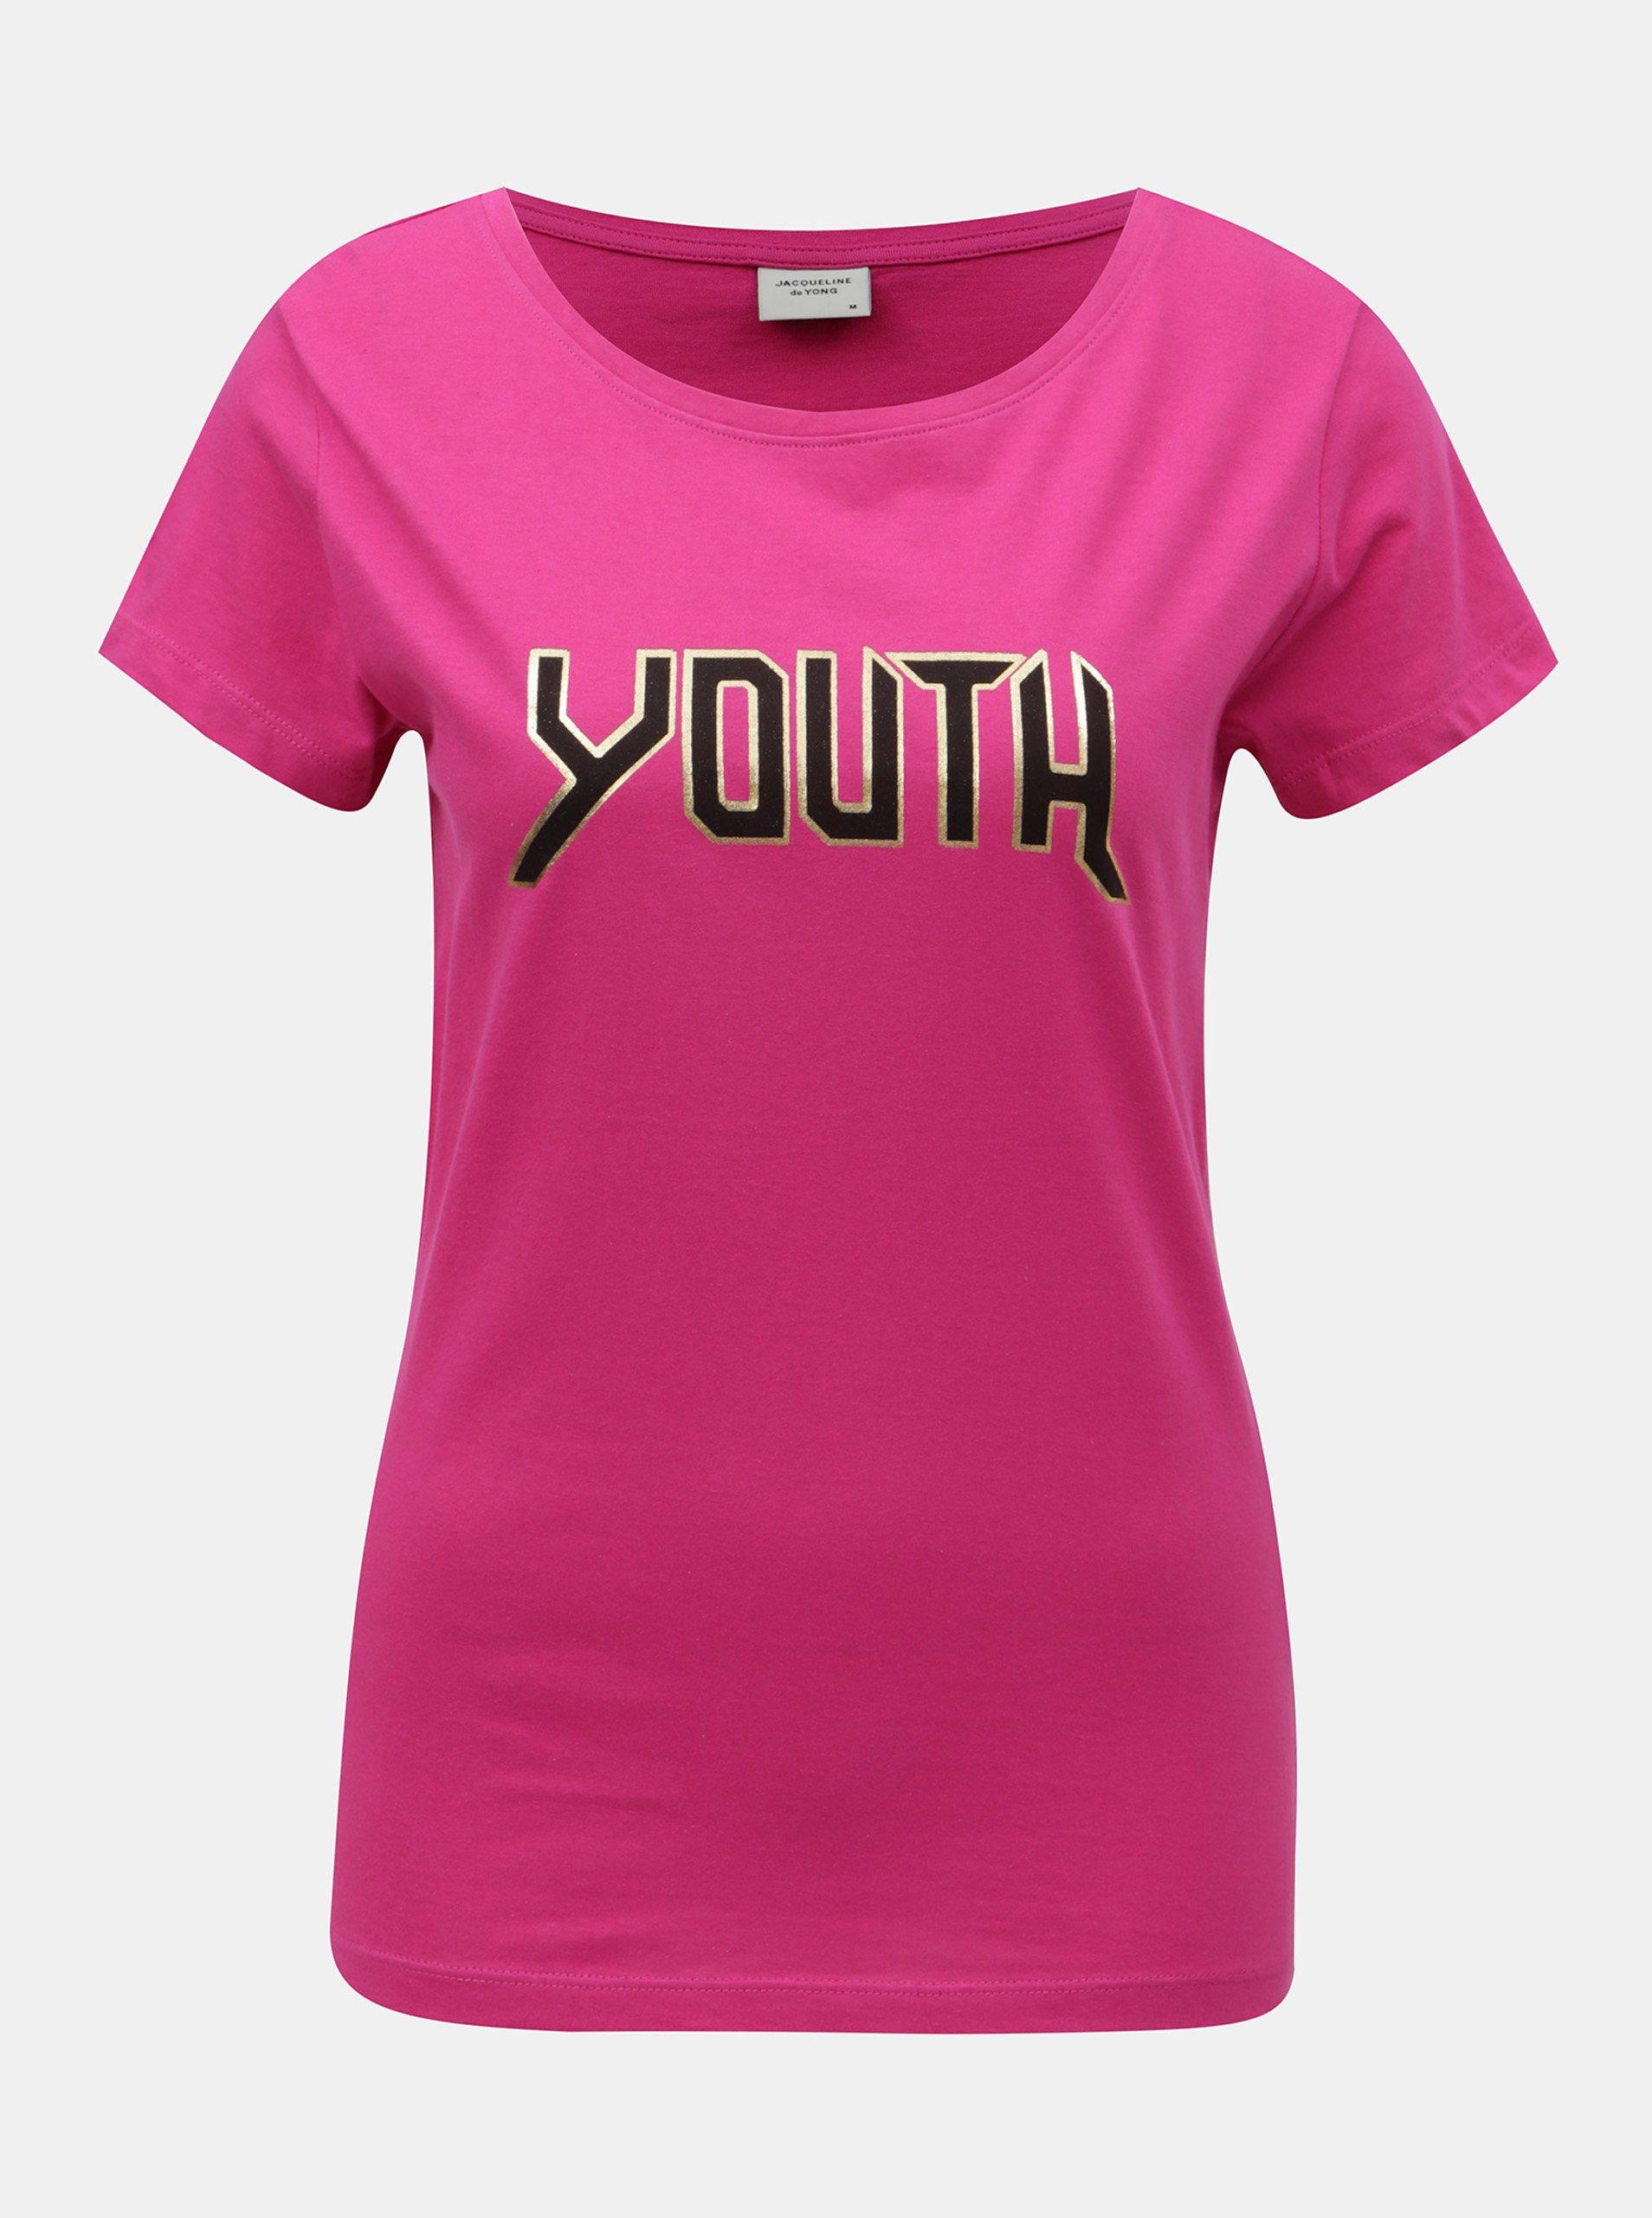 Růžové tričko s potiskem Jacqueline de Yong Chicago 9ecee3ed63